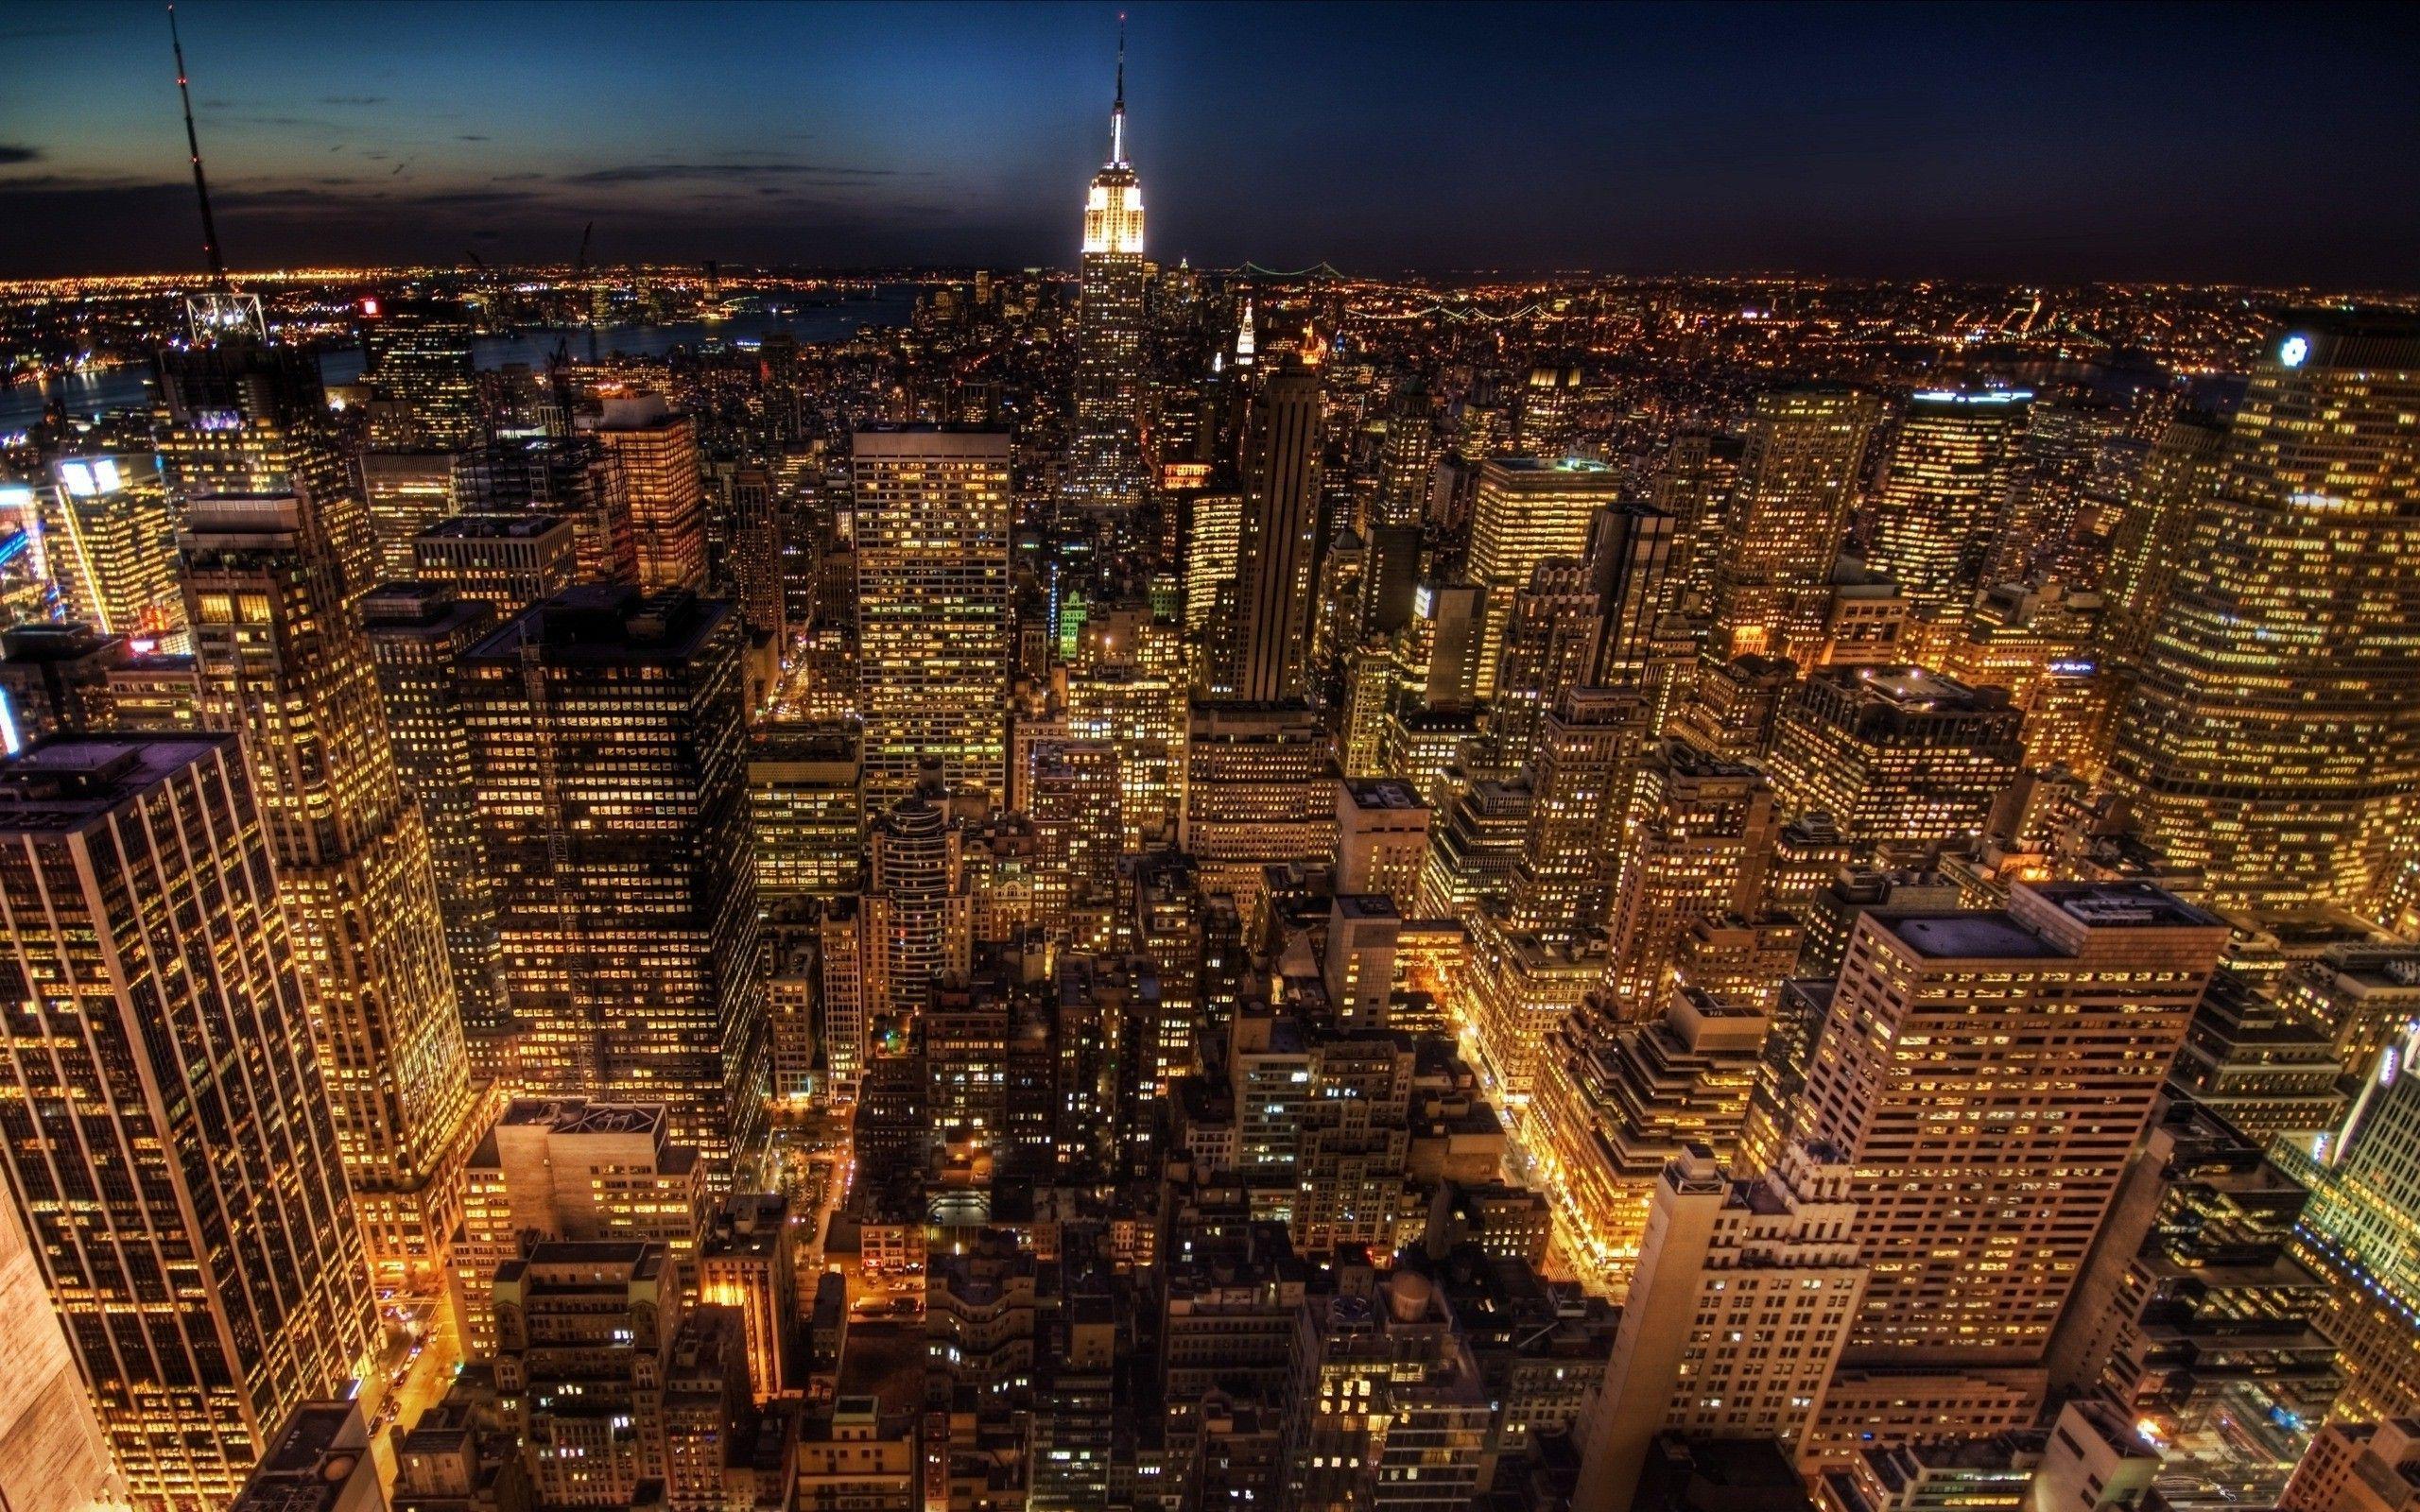 New York City Wallpaper At Night   wallpaper 2560x1600